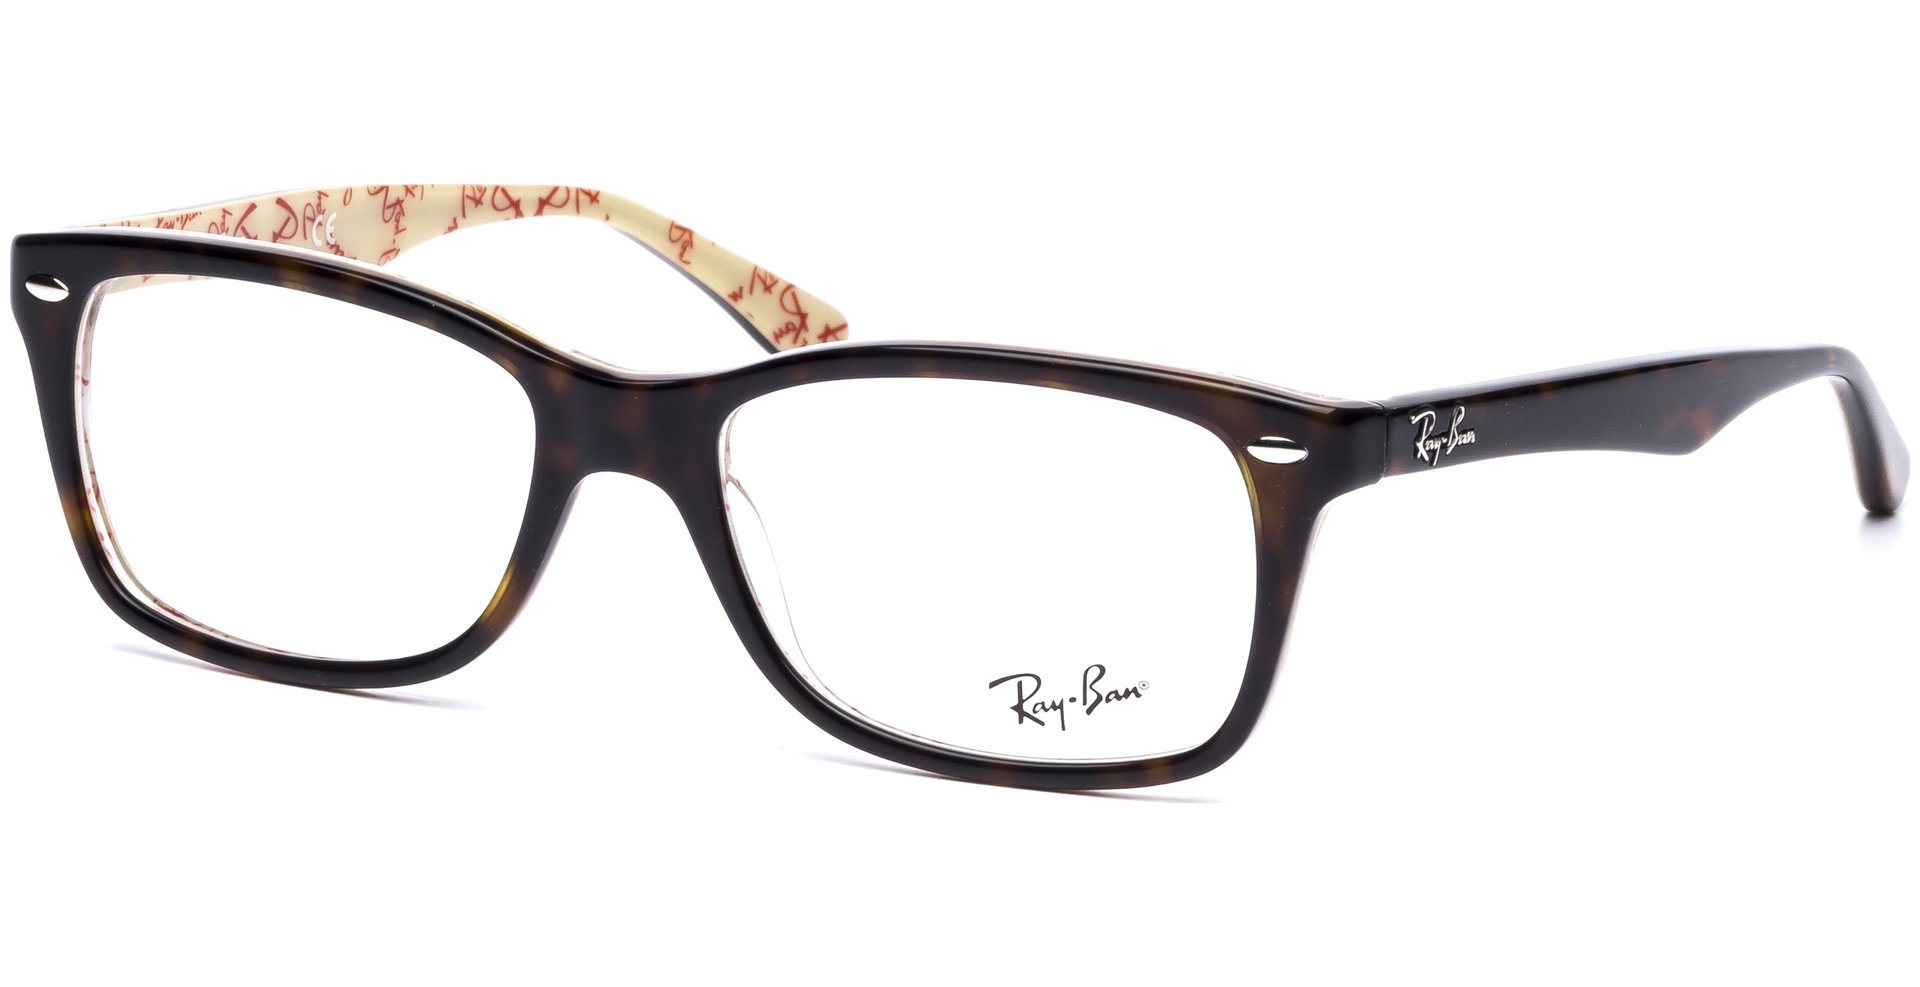 ray ban brille havanna